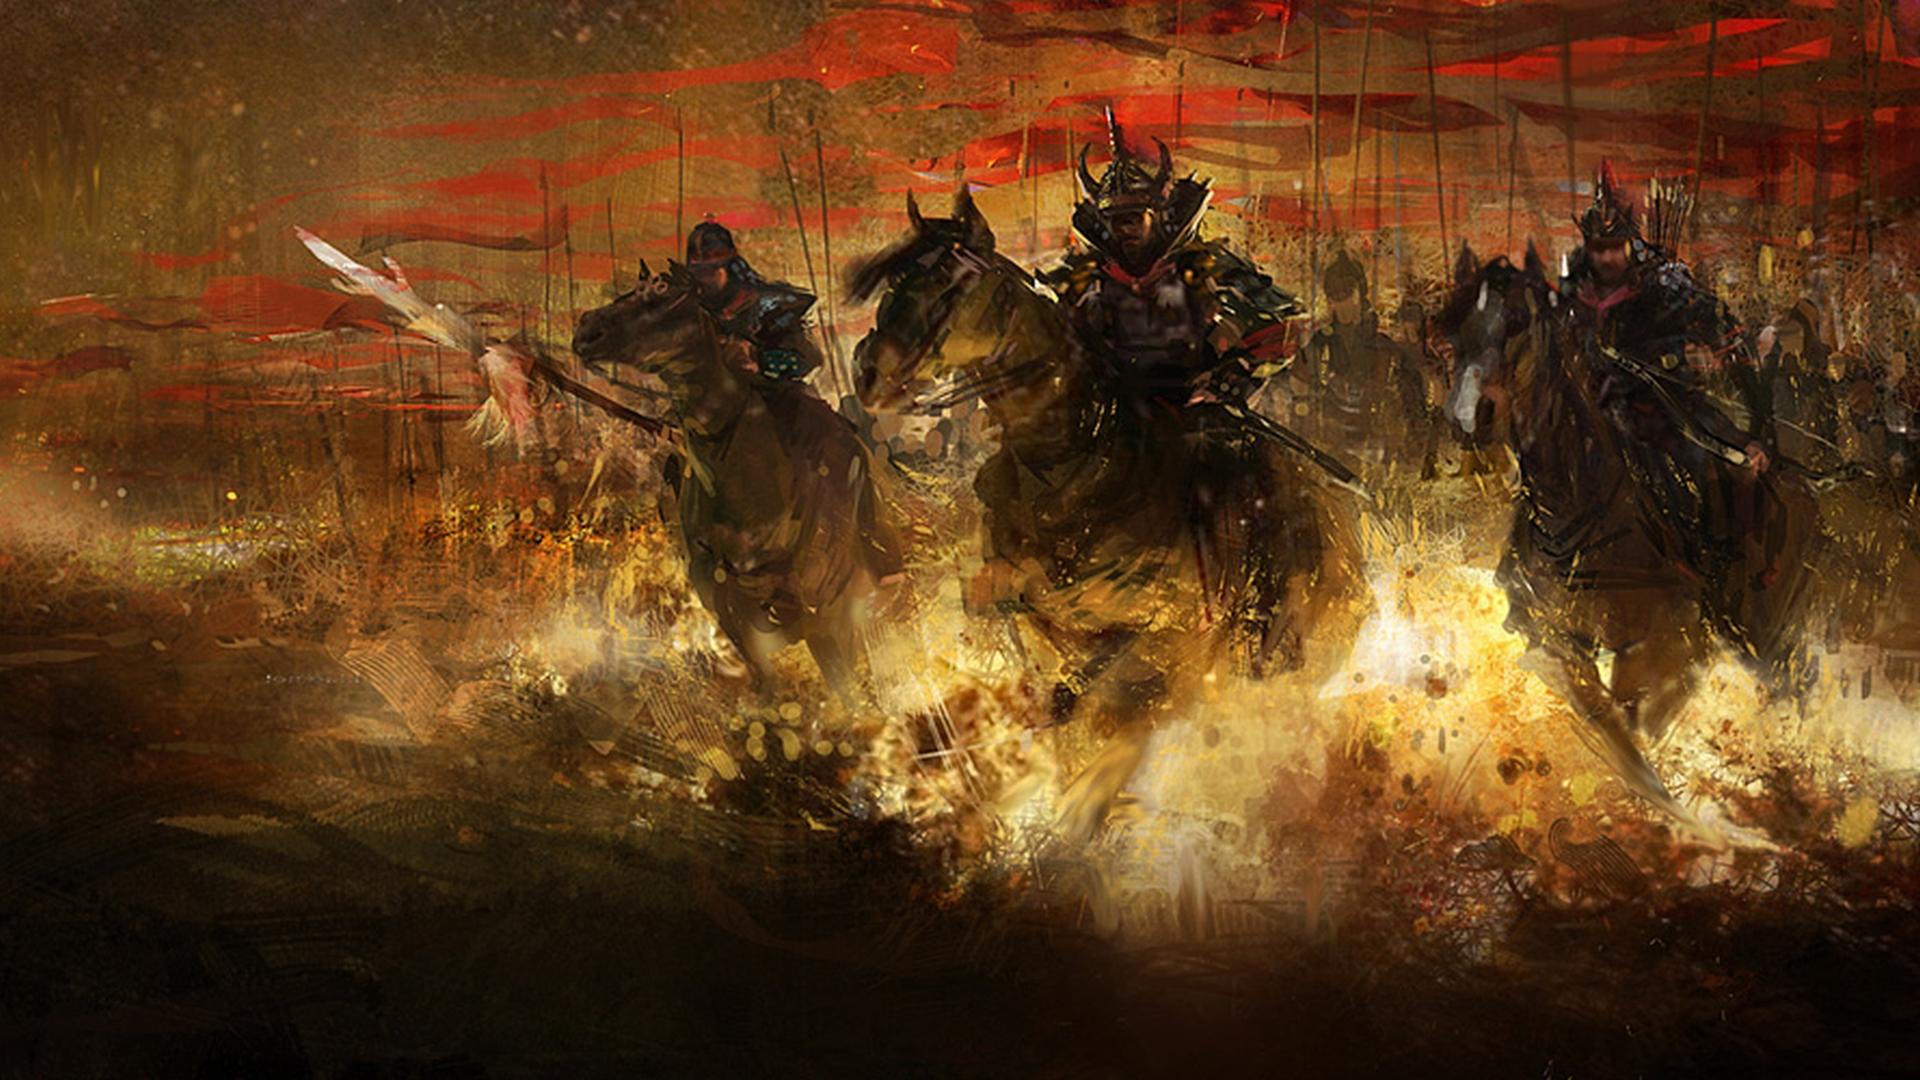 samurai wallpaper 7897